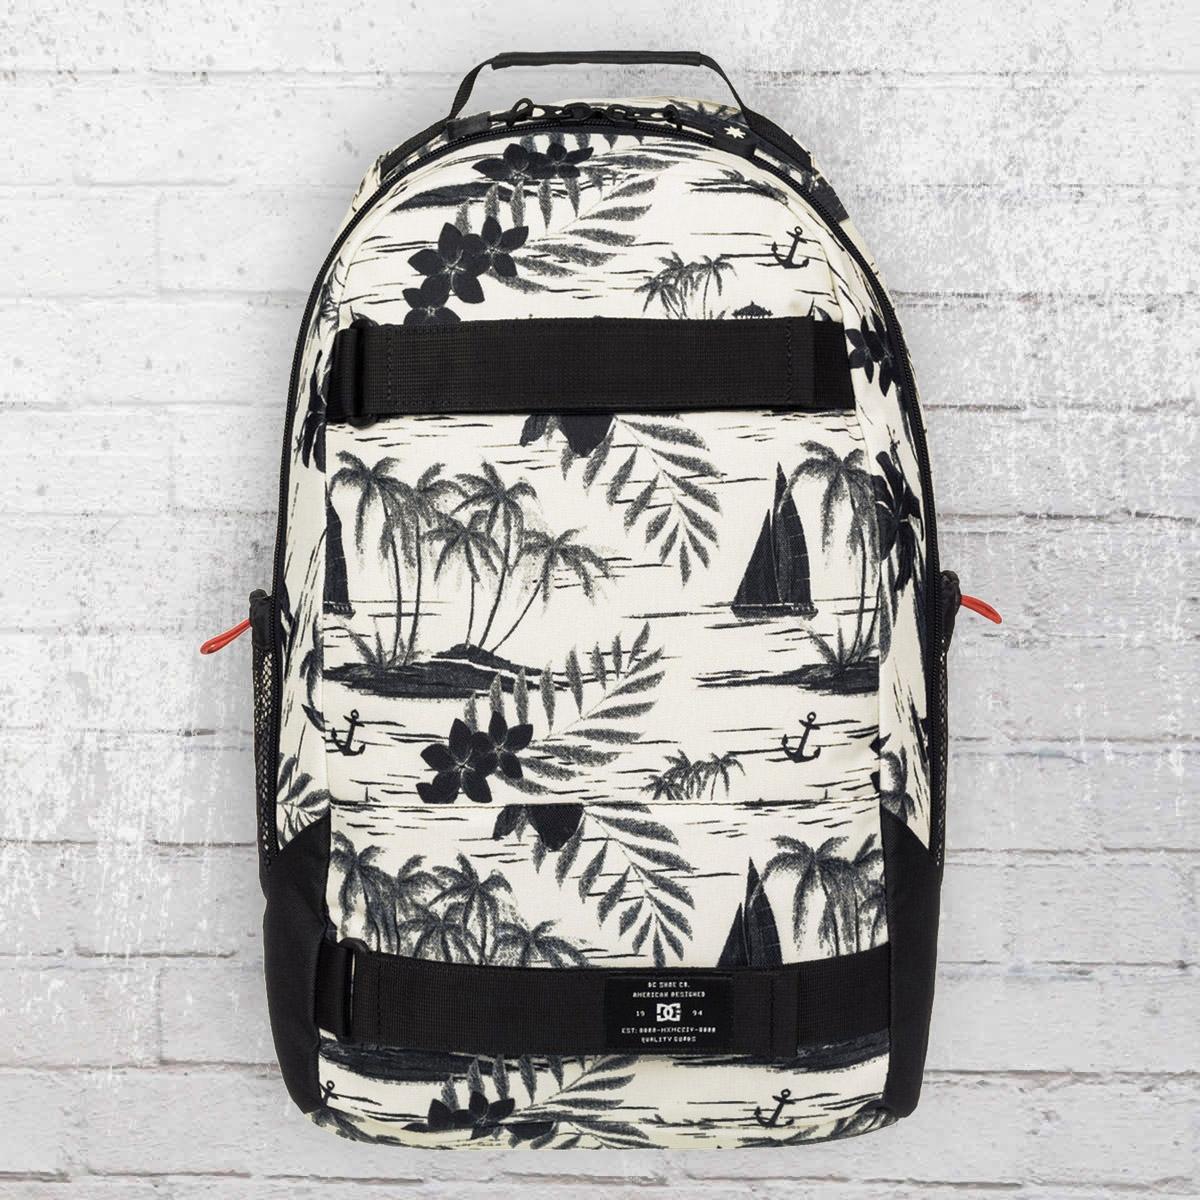 order now dc shoes grind backpack with board catcher creme white black. Black Bedroom Furniture Sets. Home Design Ideas